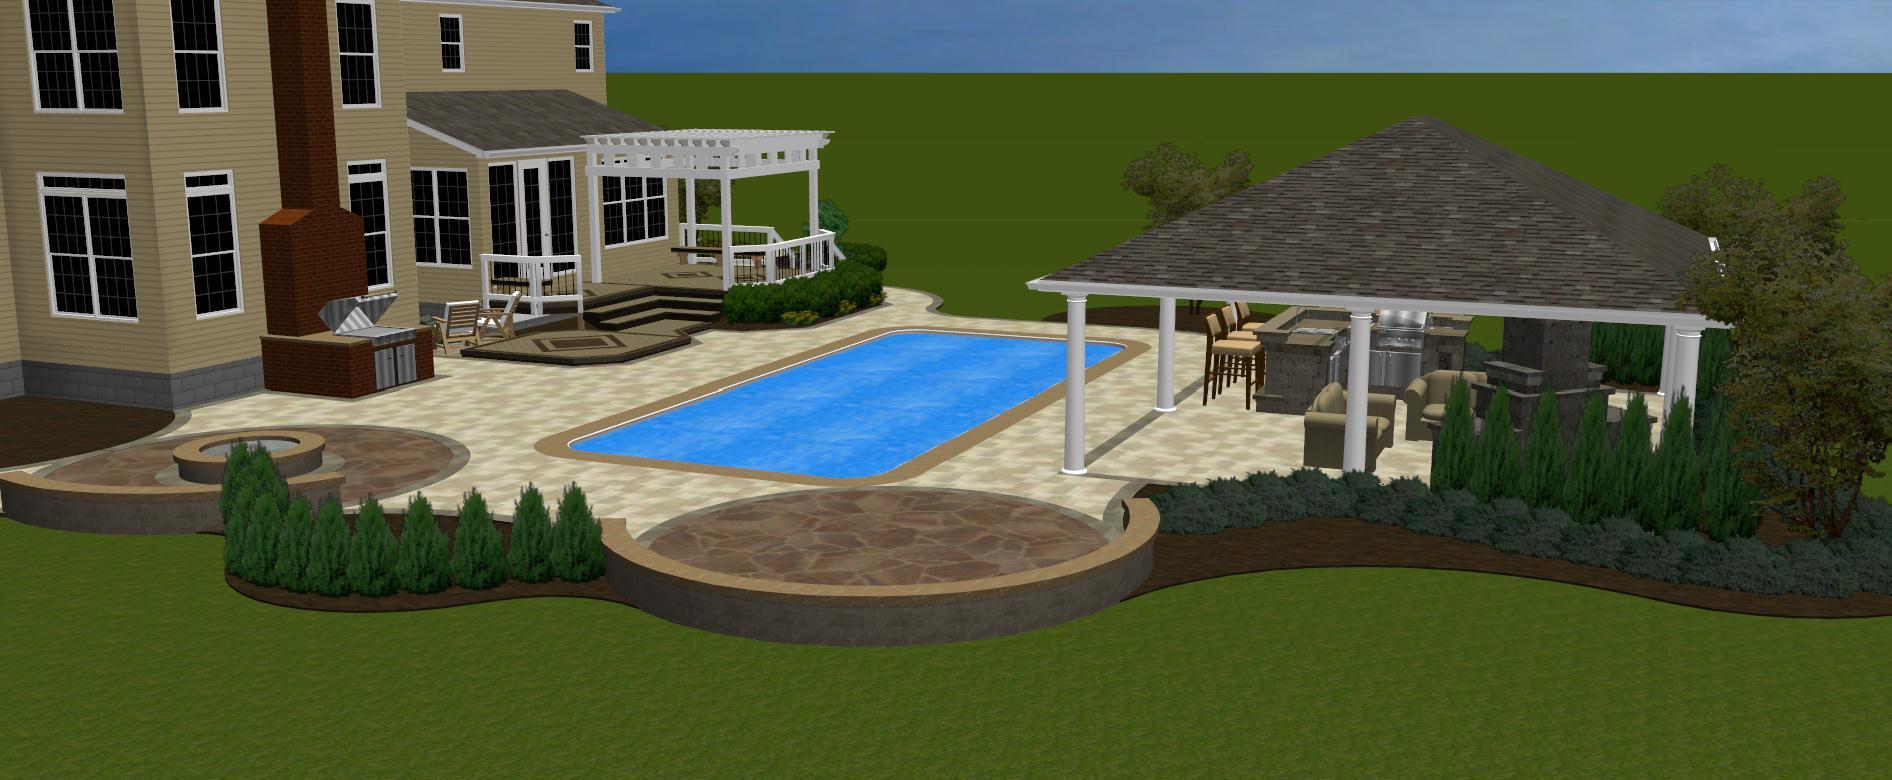 Columbus OH dream backyards - Columbus Decks, Porches and ... on Dream Backyard Ideas id=71359